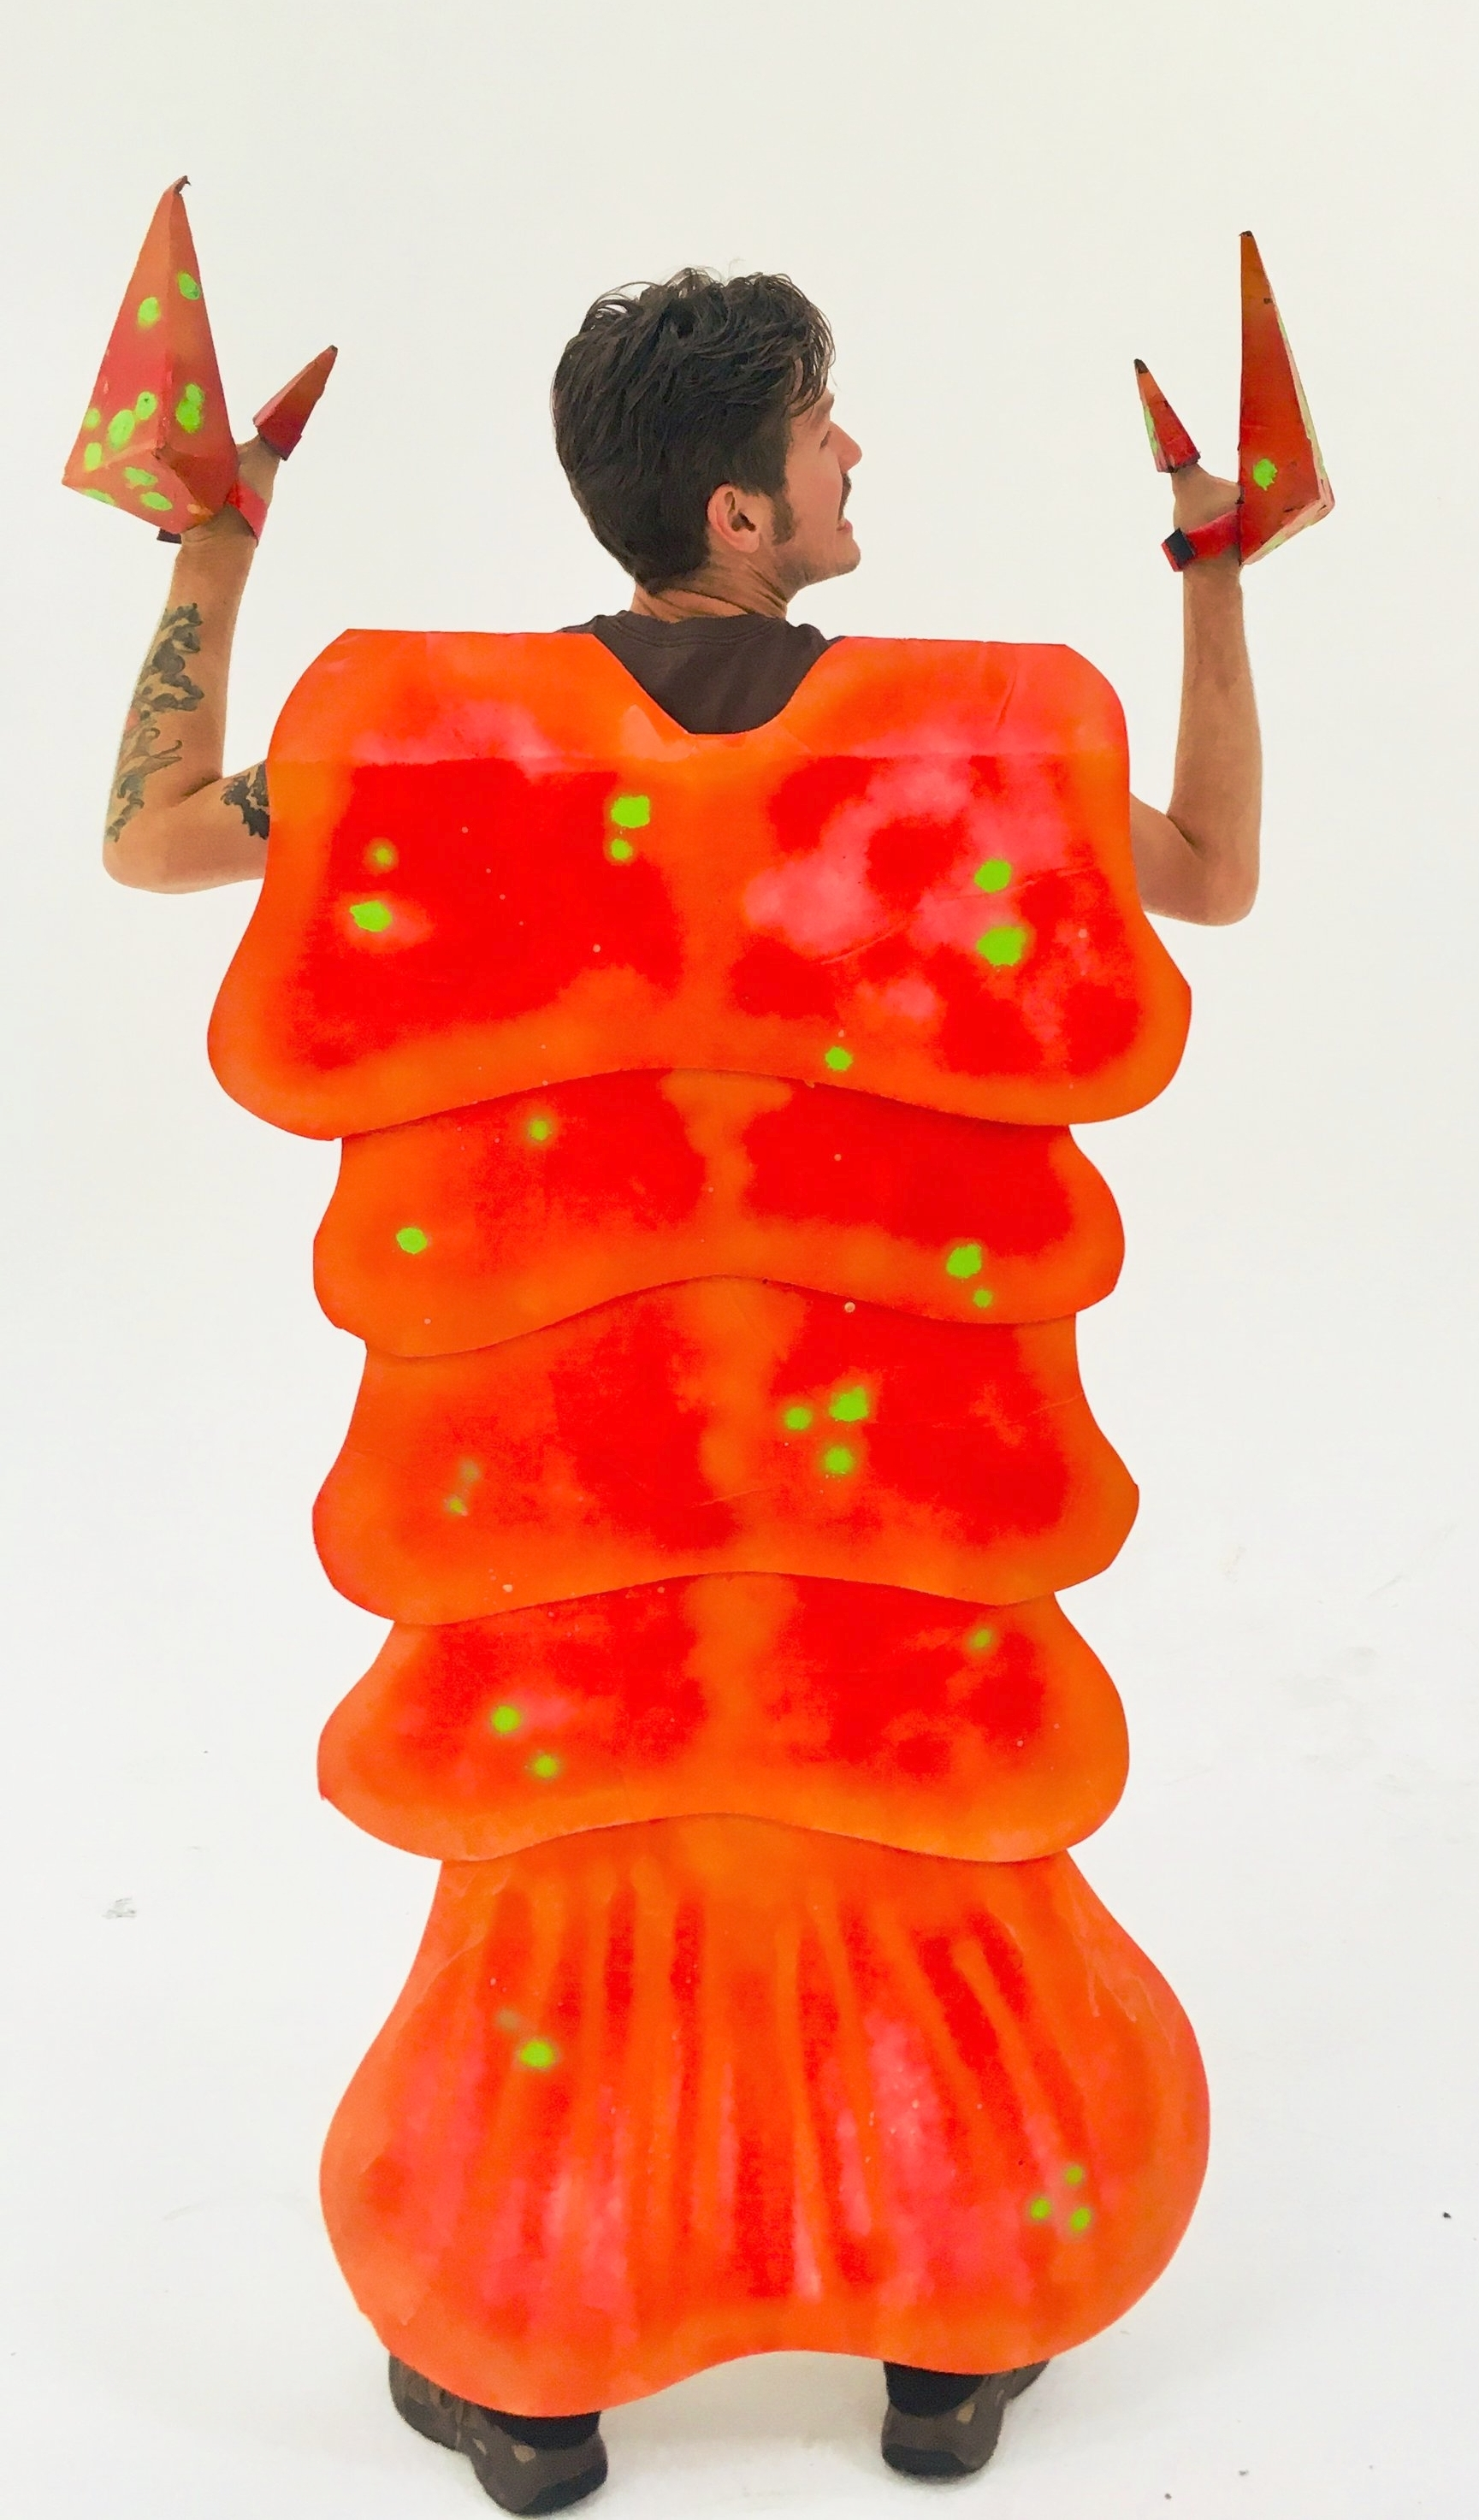 kingcrustacean_keaneggett_kean_costume_halloween.JPG